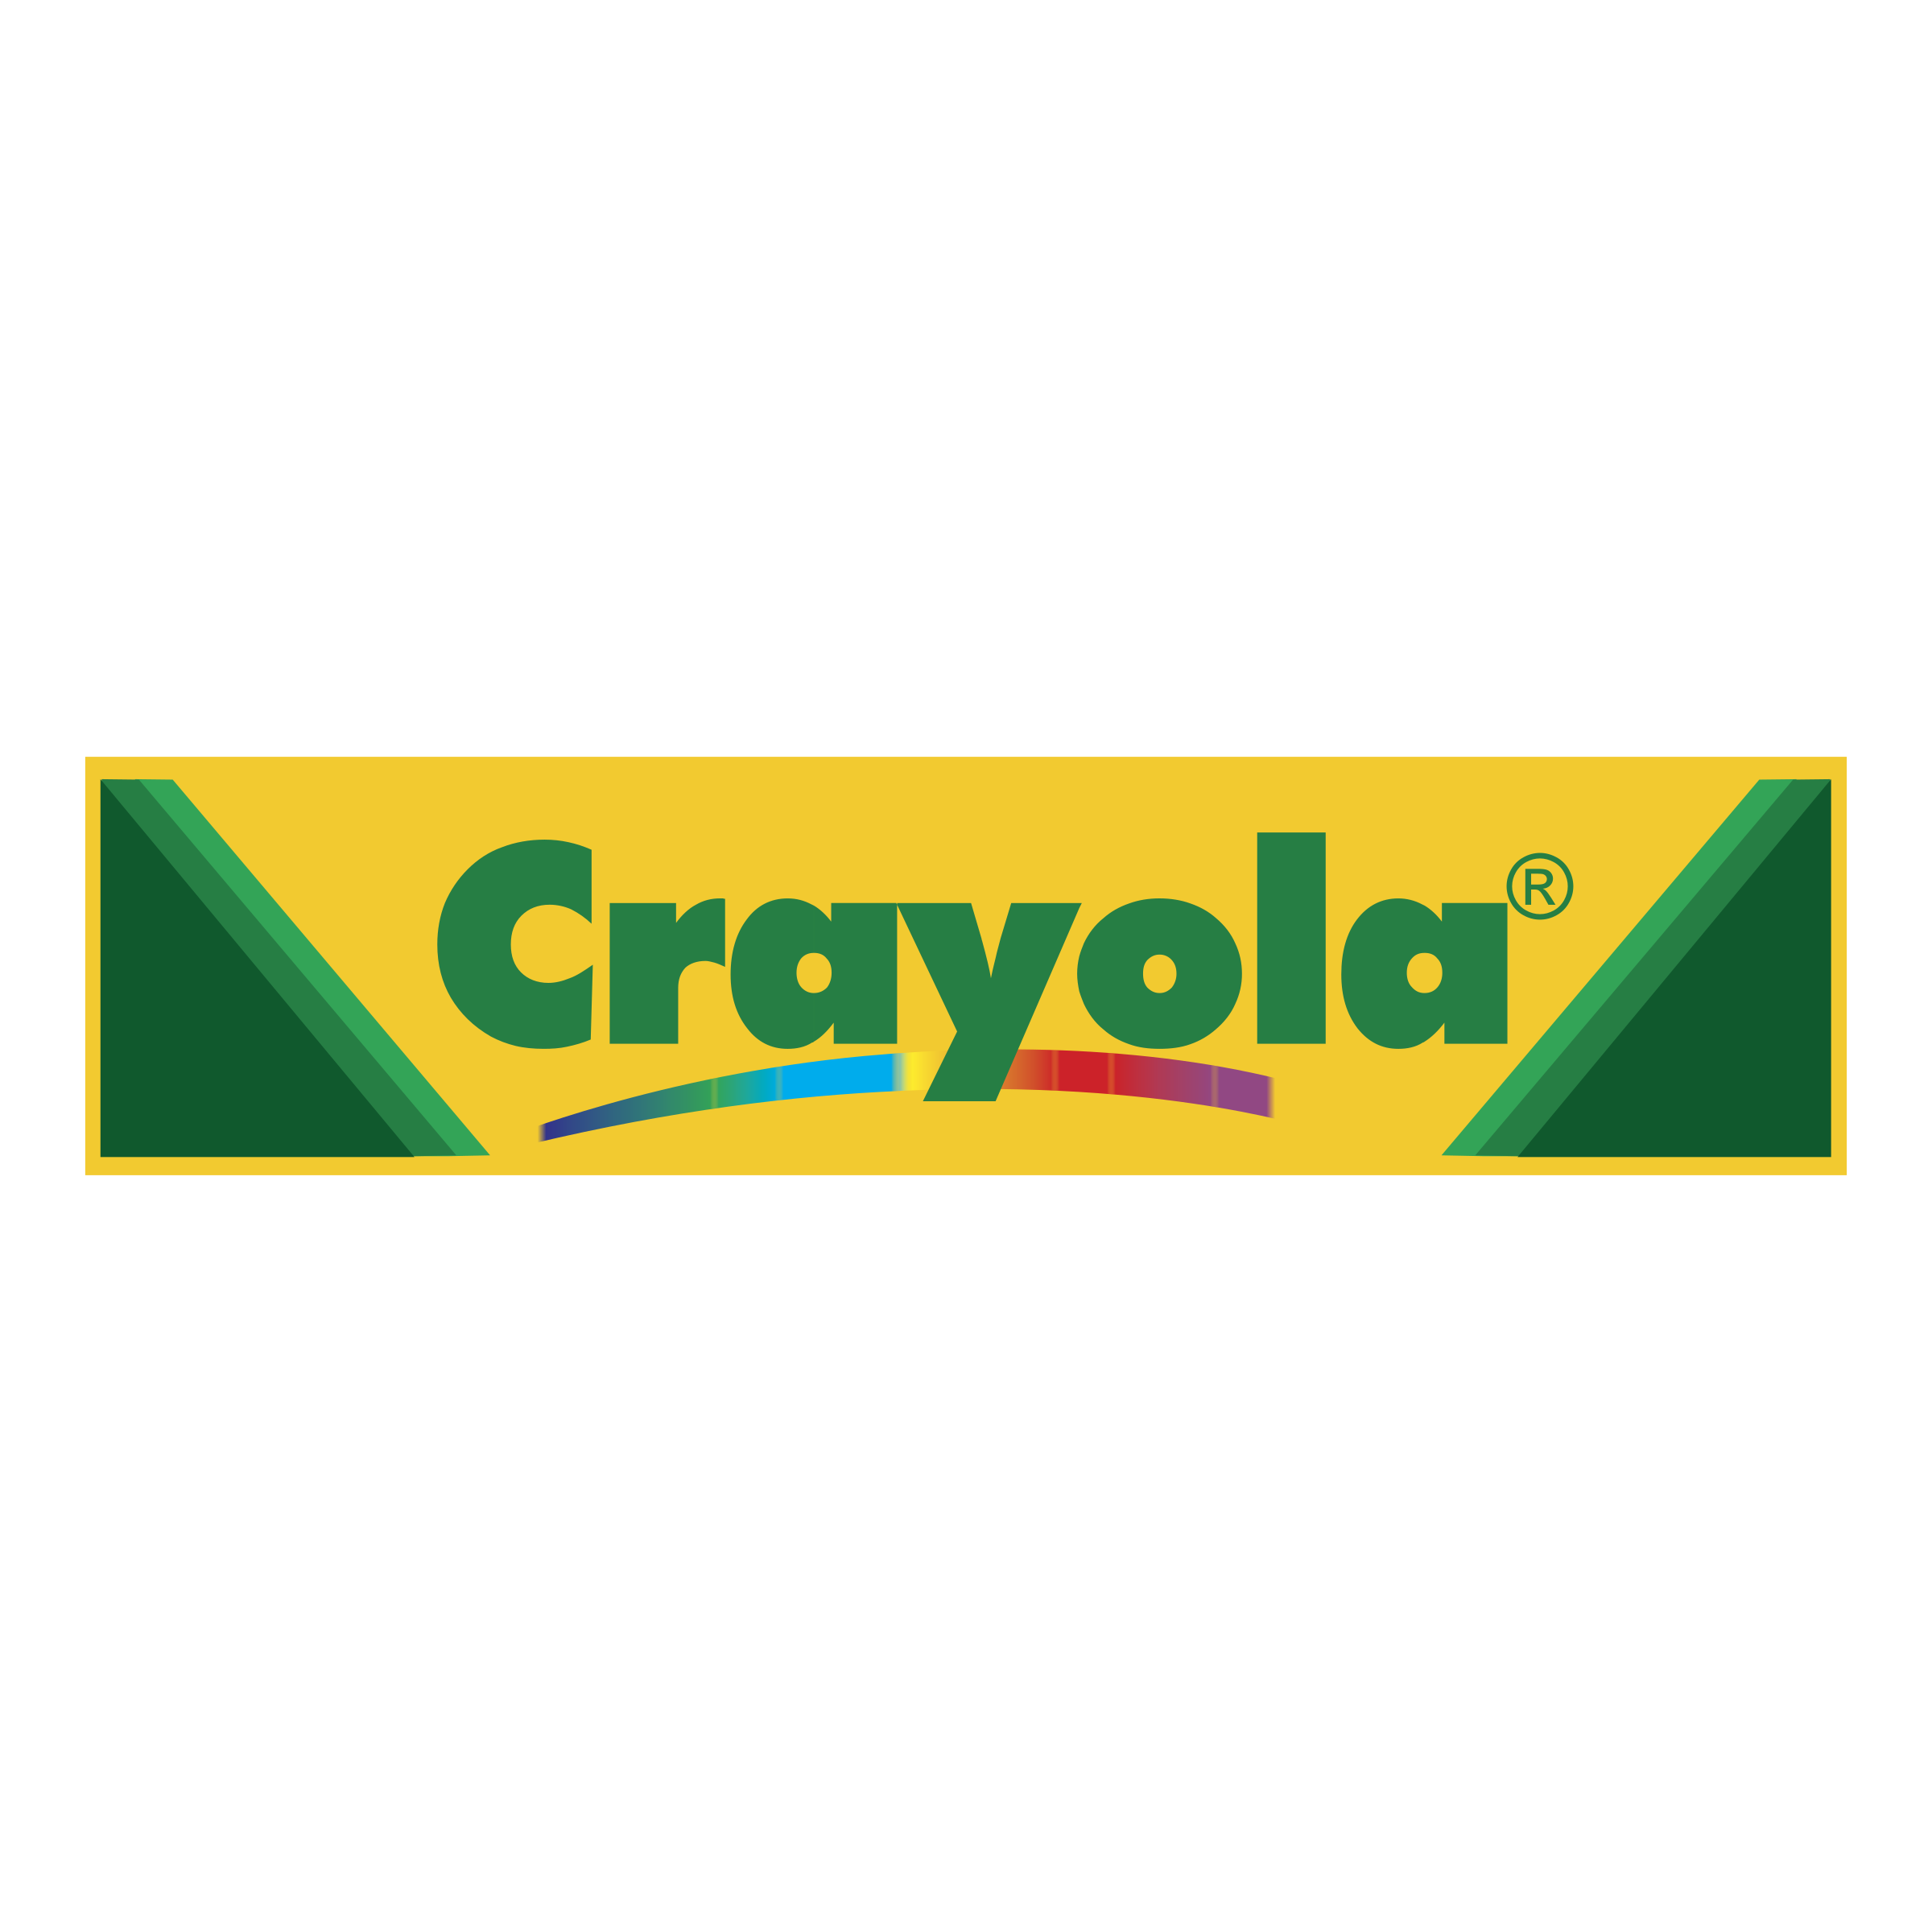 Crayola Logo PNG Transparent & SVG Vector.